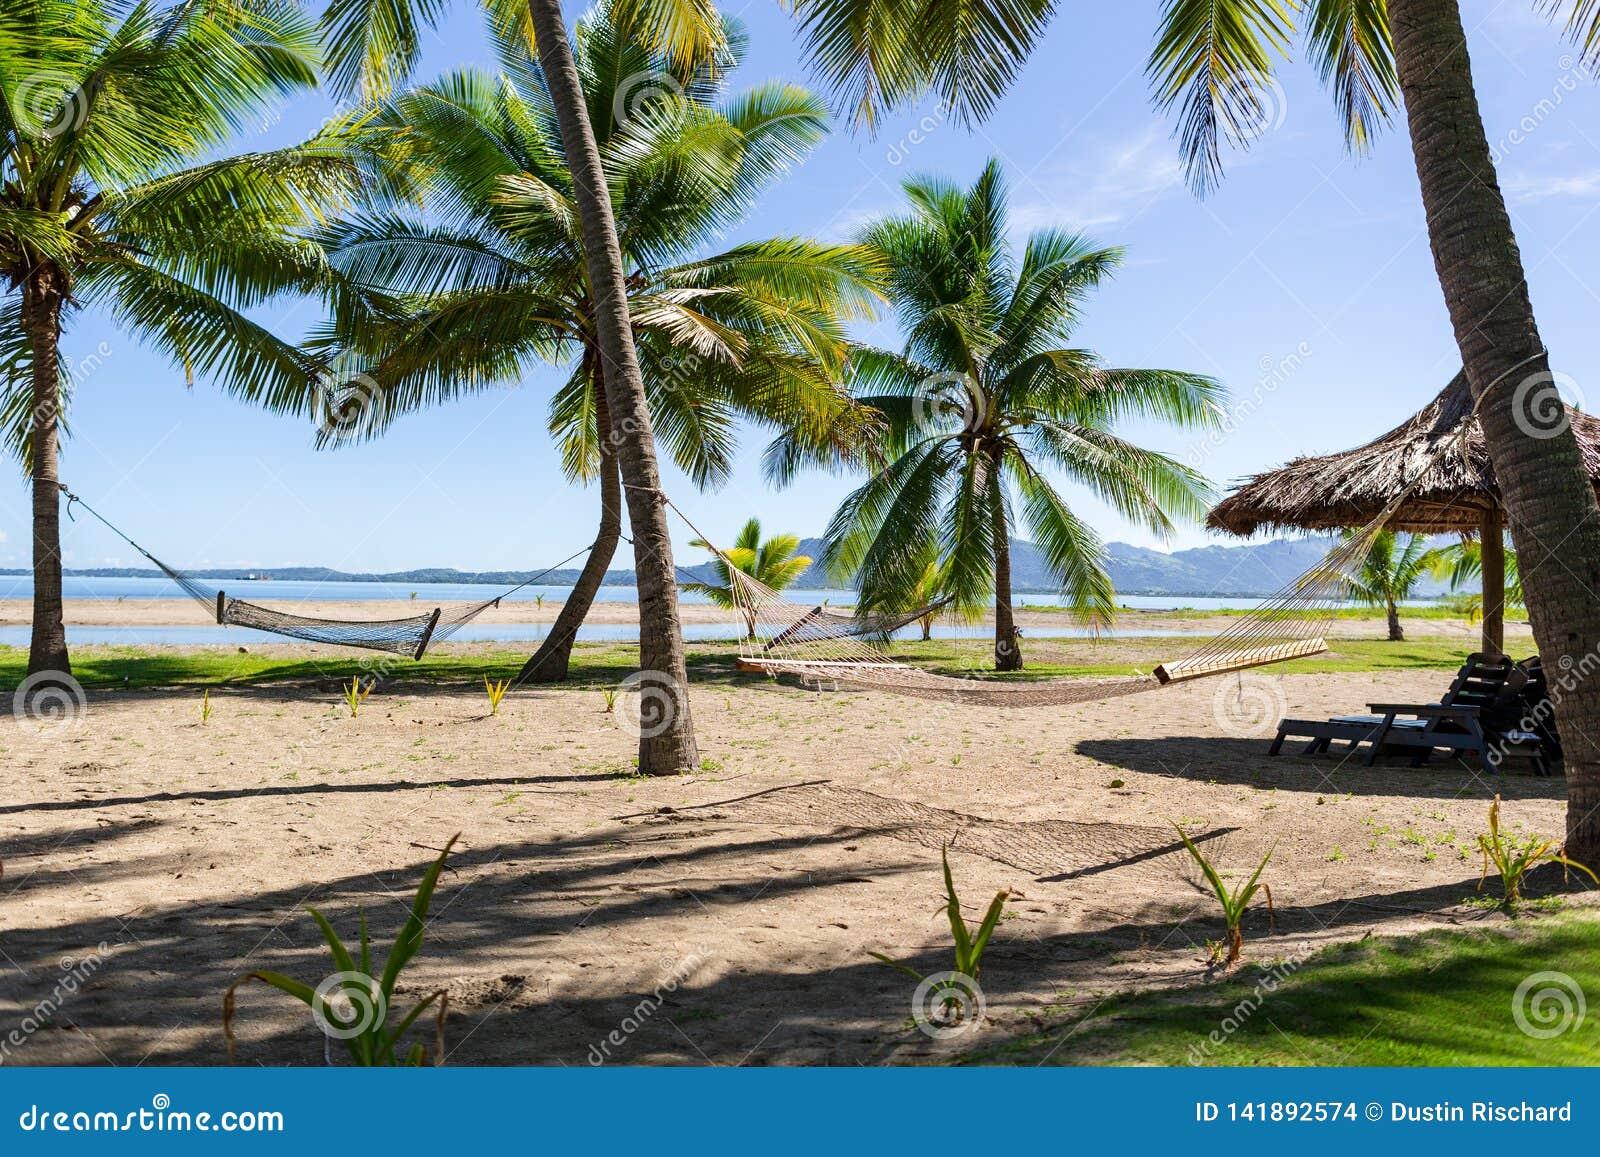 Redes nos visitantes de espera da praia de Fiji a relaxar neles